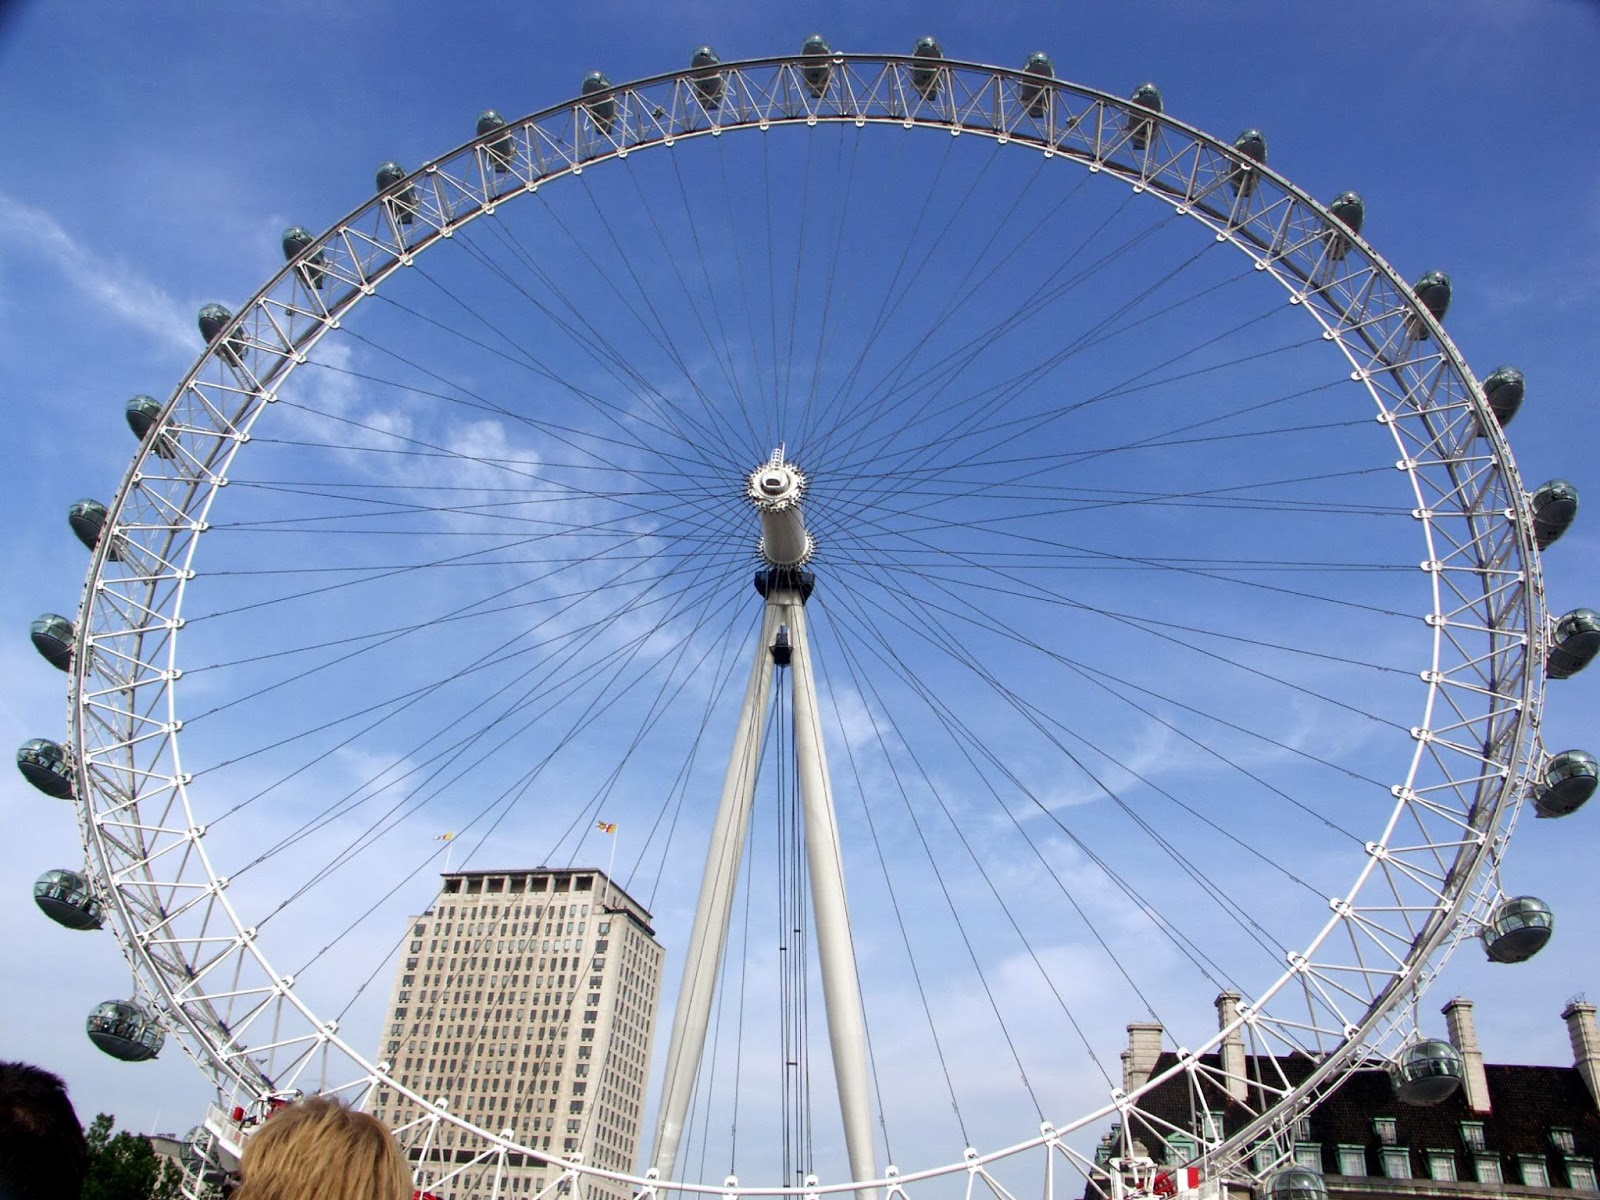 London Eye Millennium Wheel